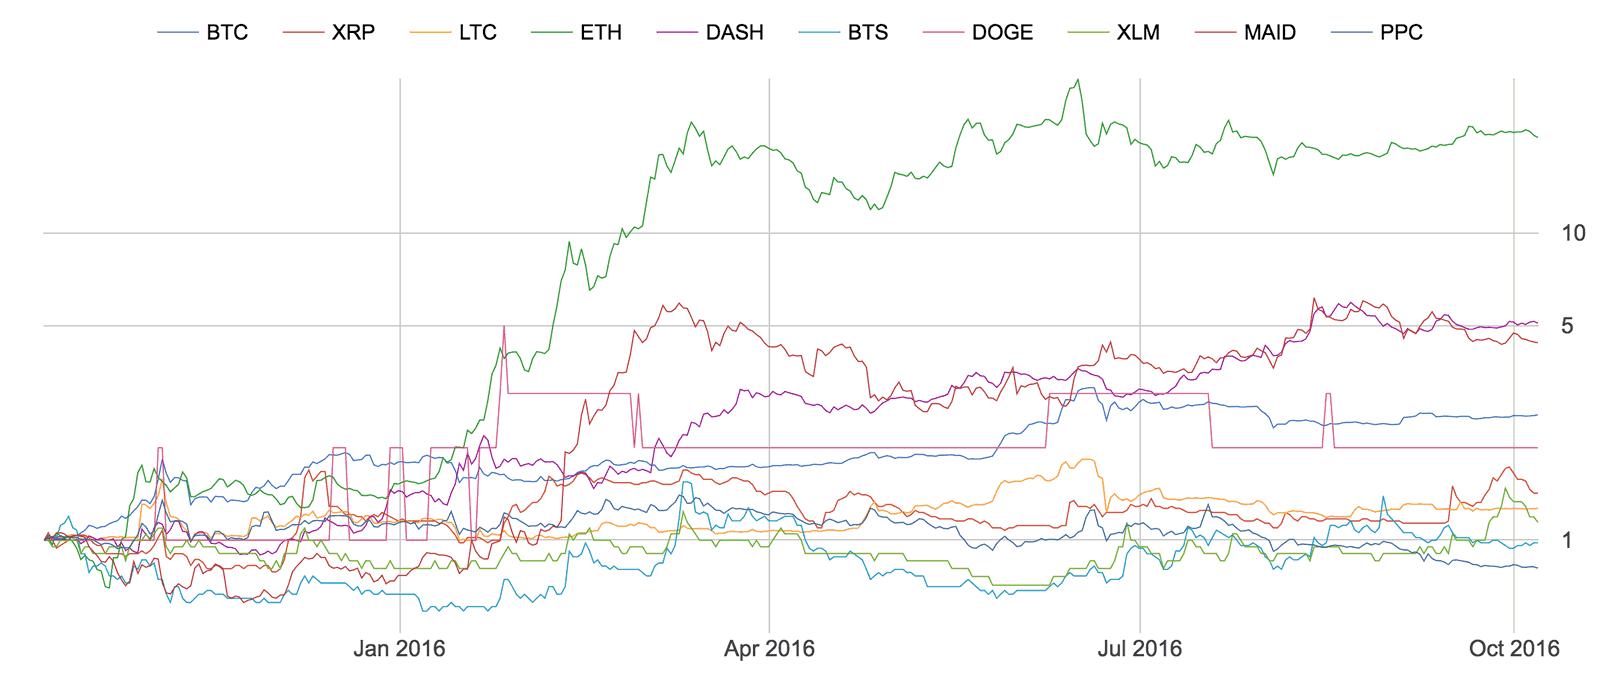 Top 10 coins, returns starting 12 months ago